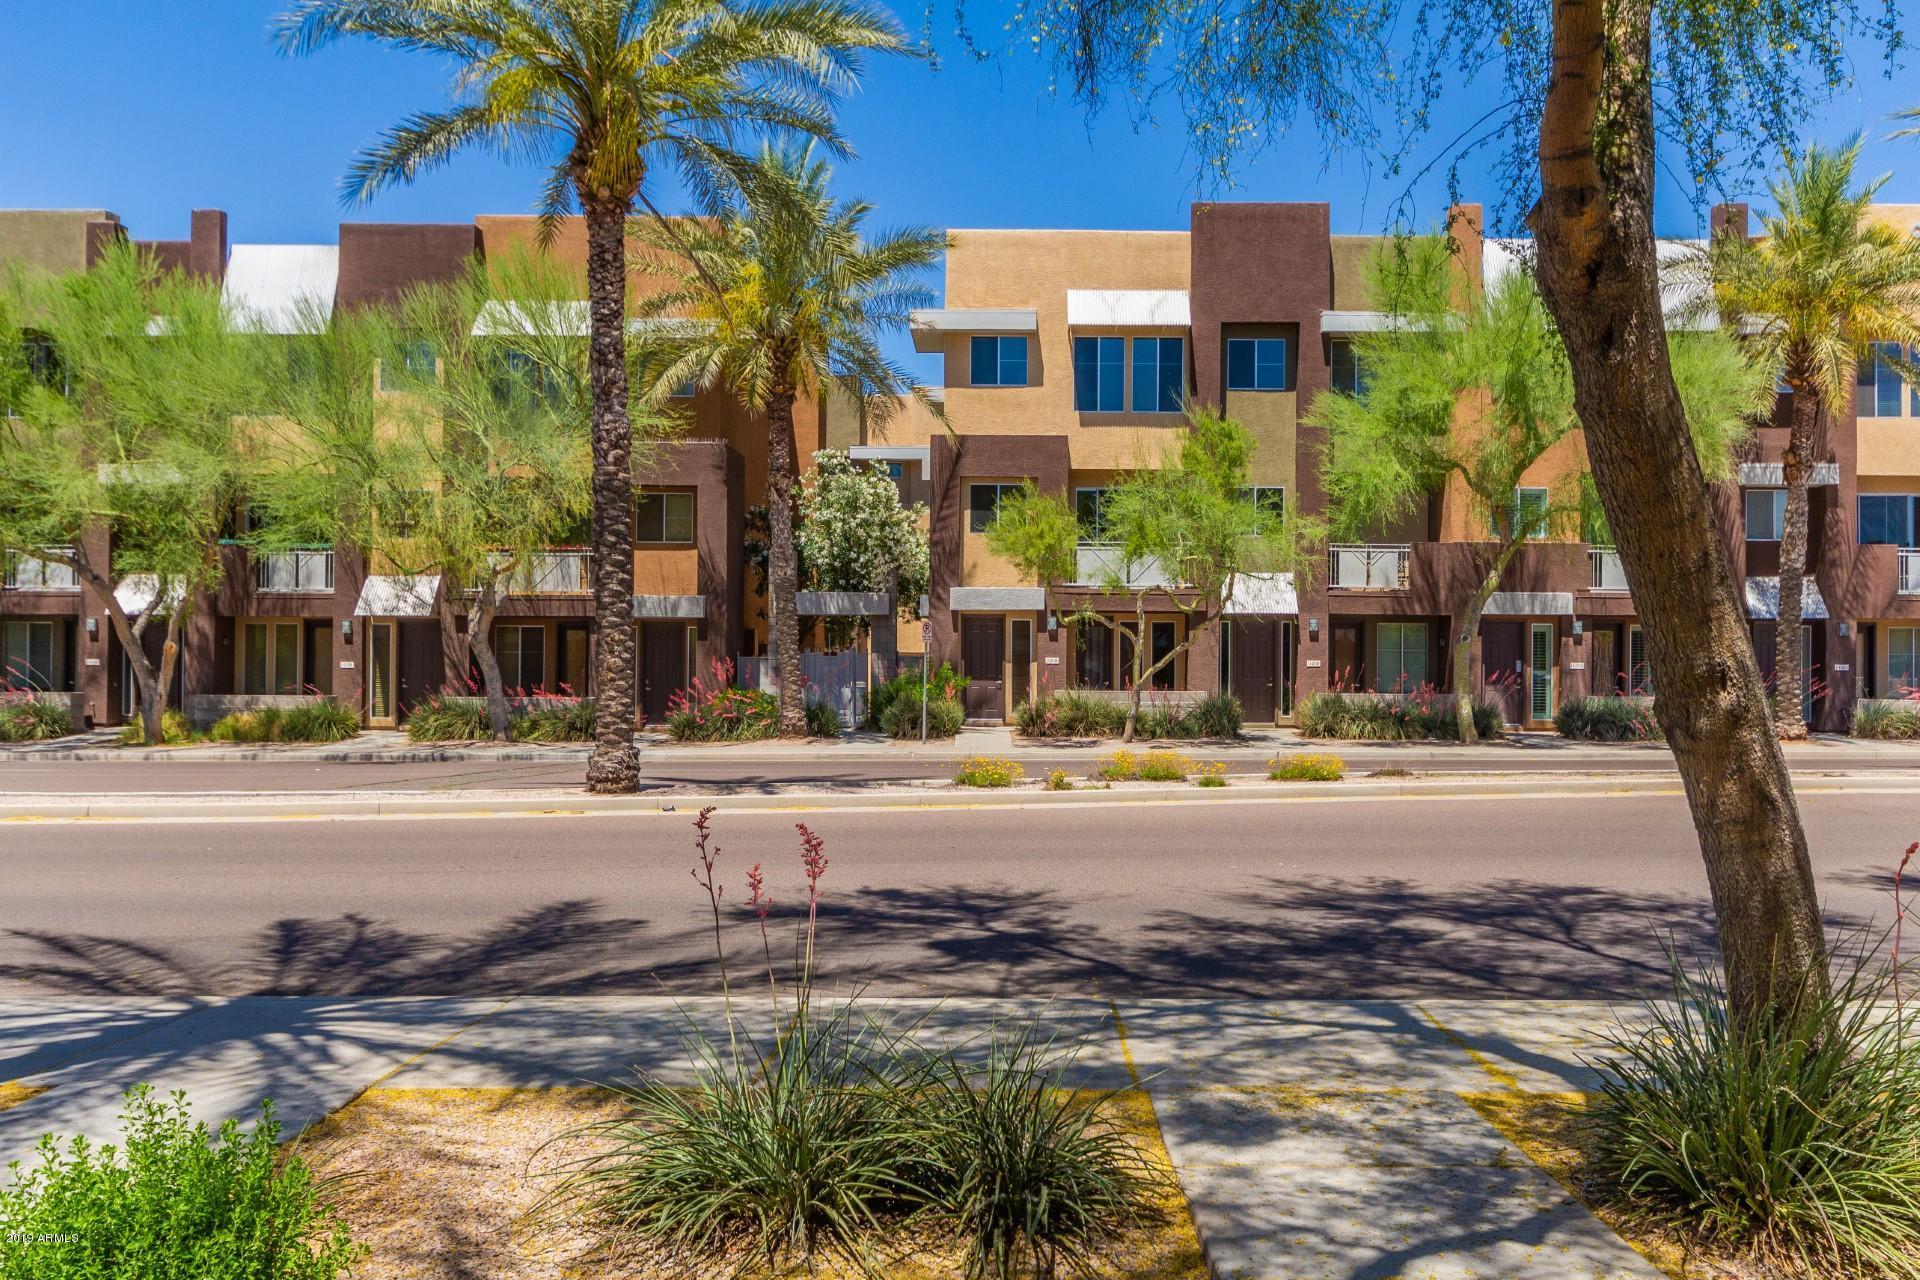 MLS 5917284 6605 N 93RD Avenue Unit 1059, Glendale, AZ 85305 Glendale AZ Condo or Townhome